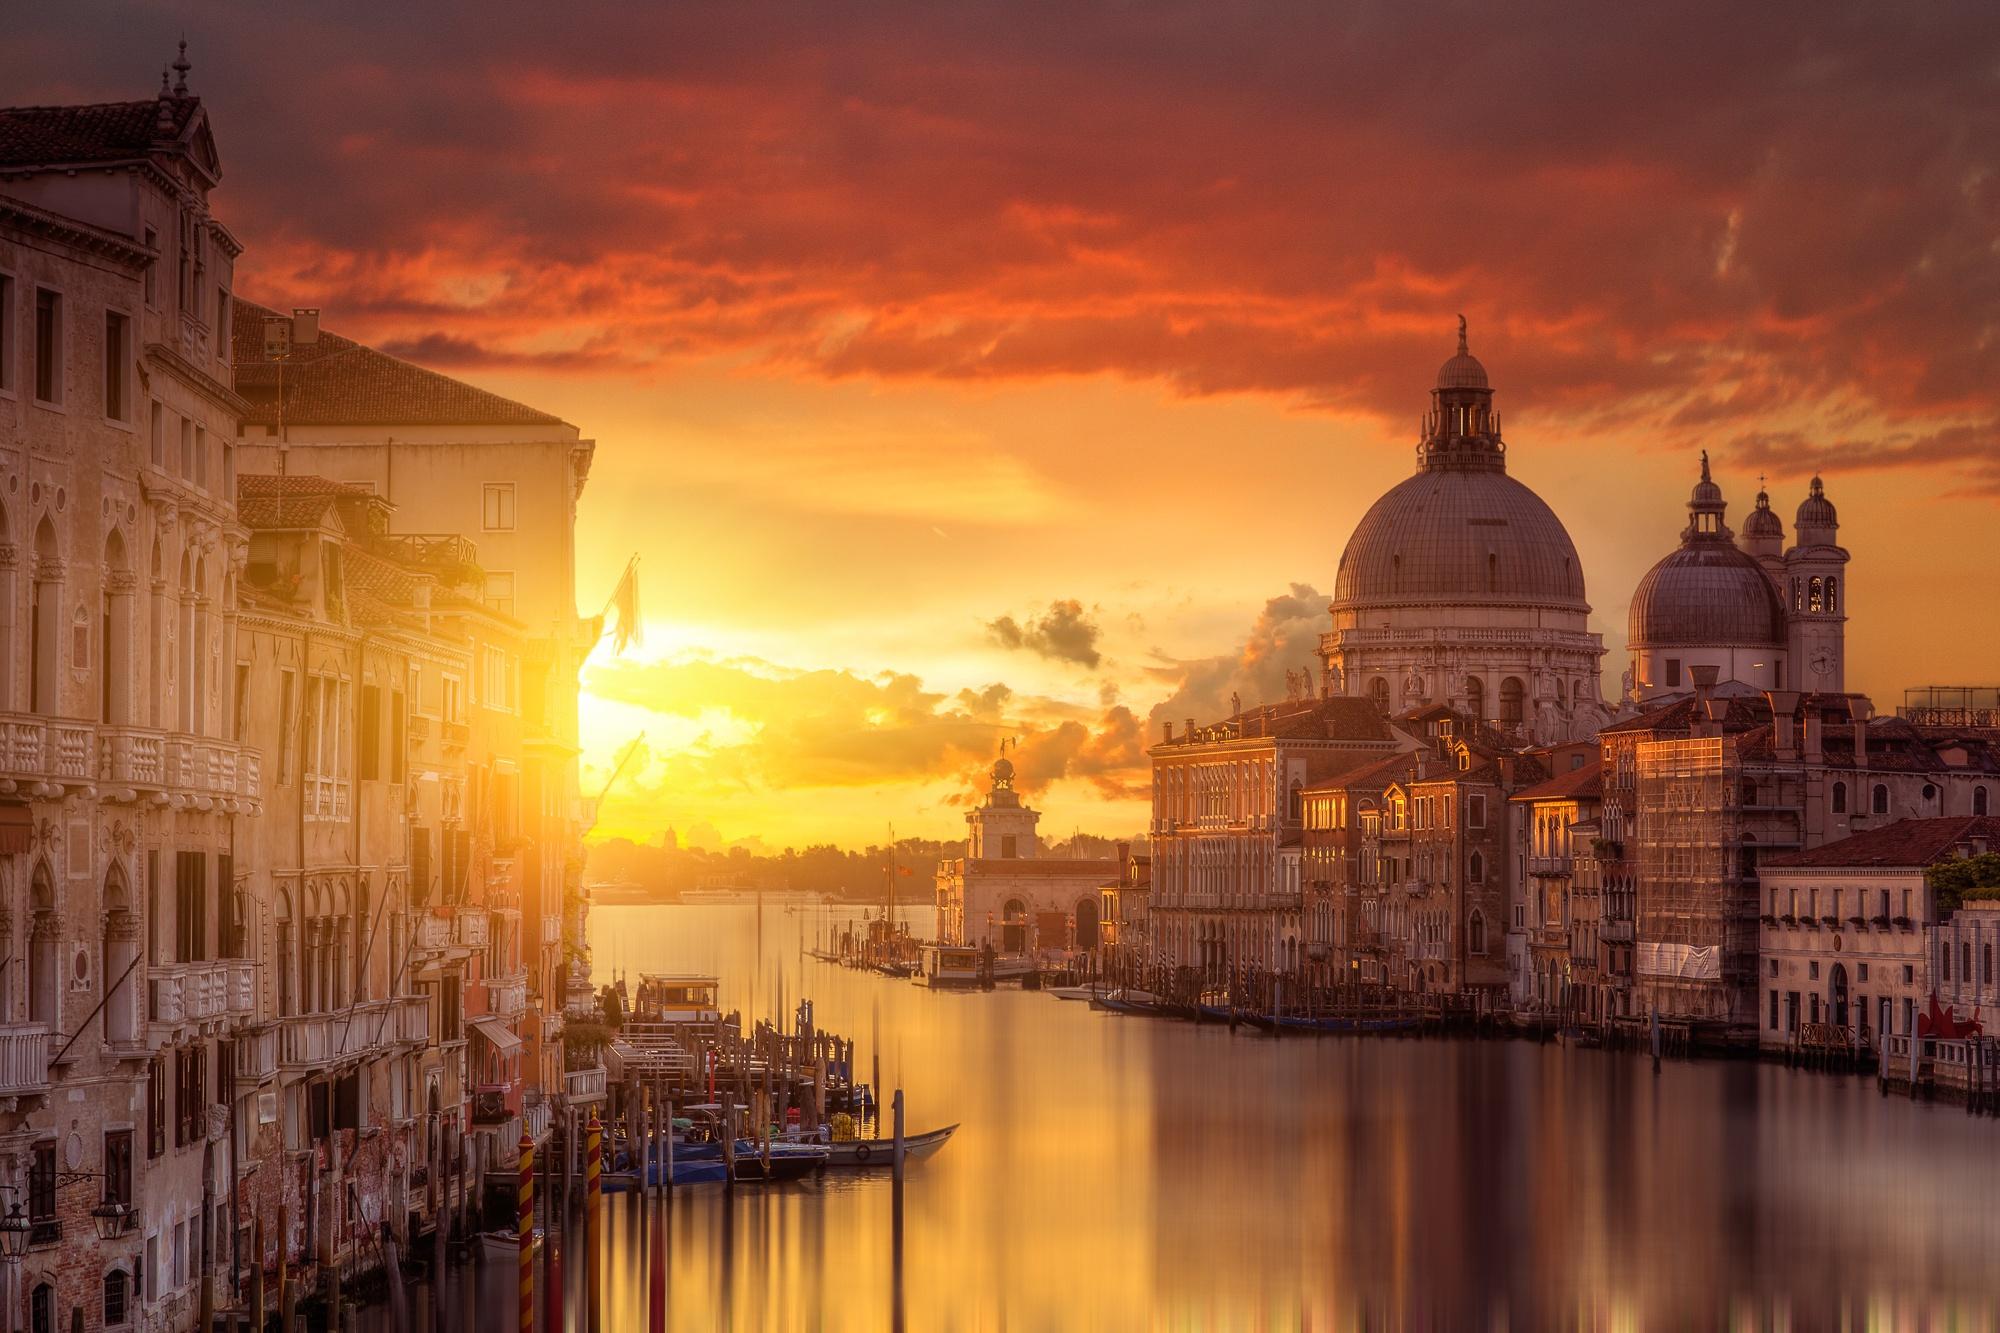 Sunset in Venice : pics